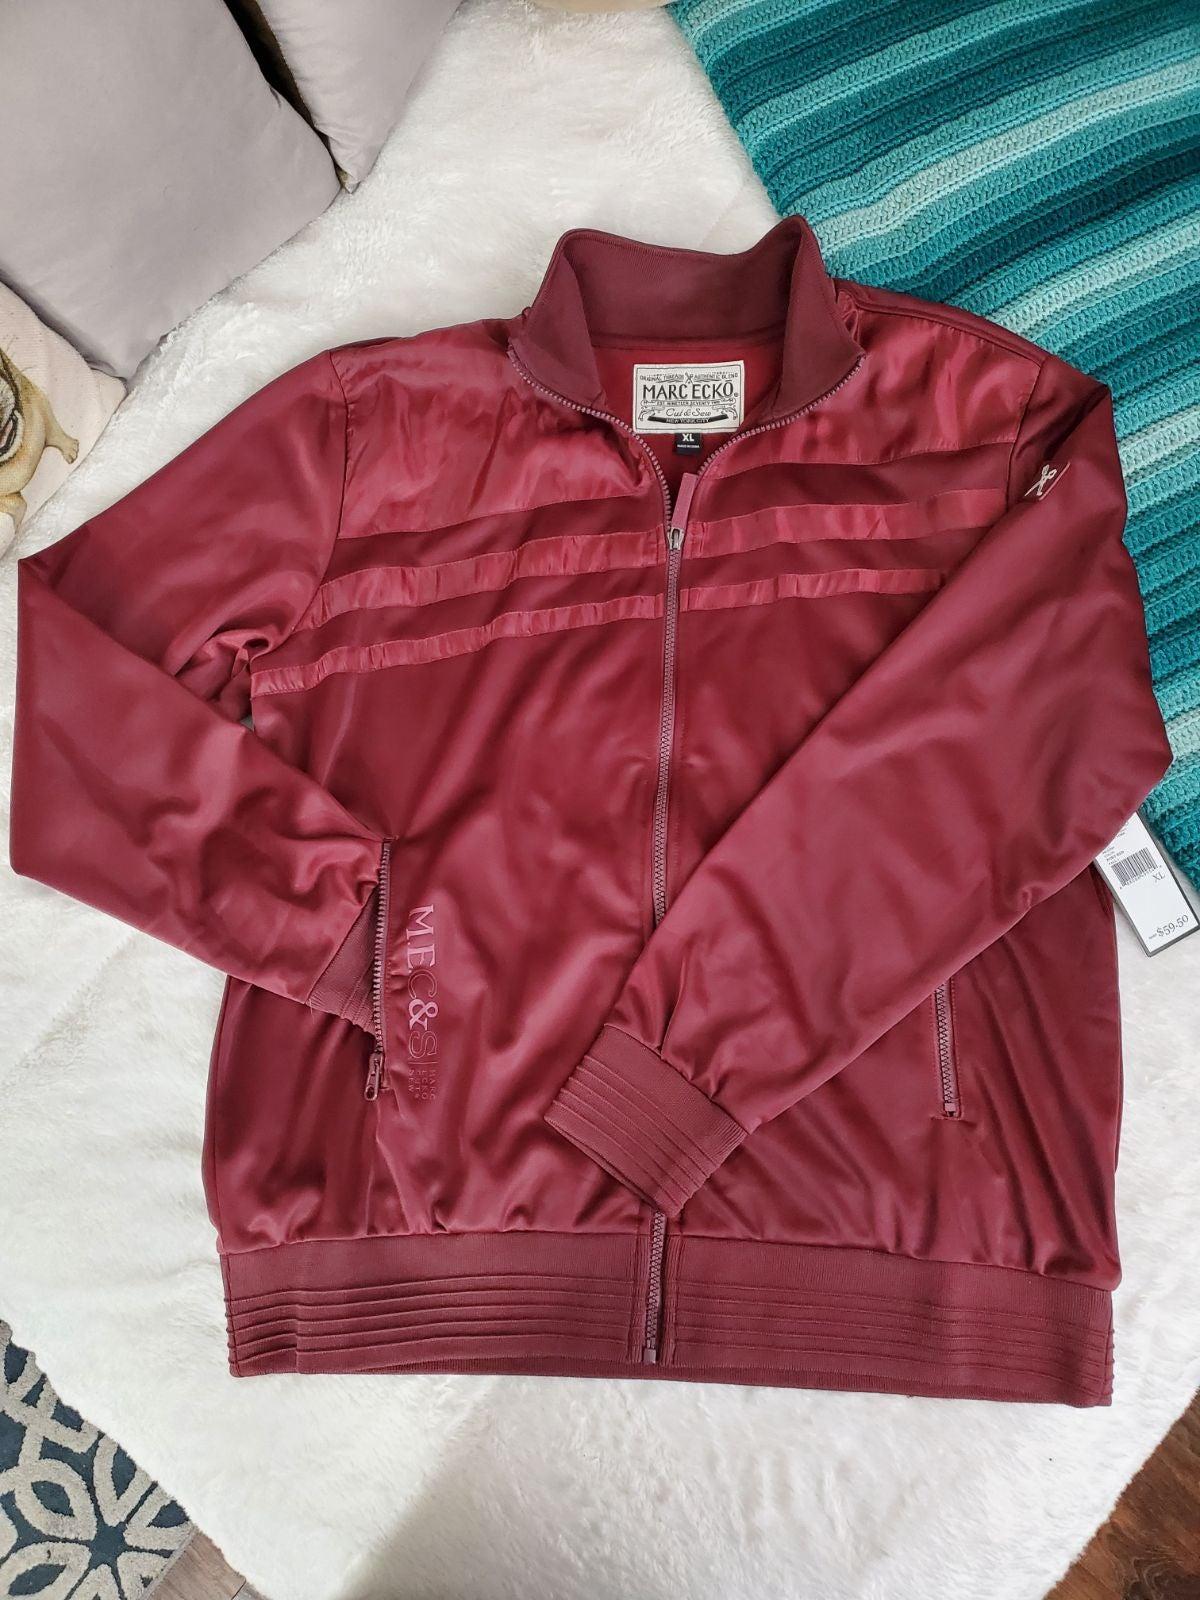 Marc ecko track jacket